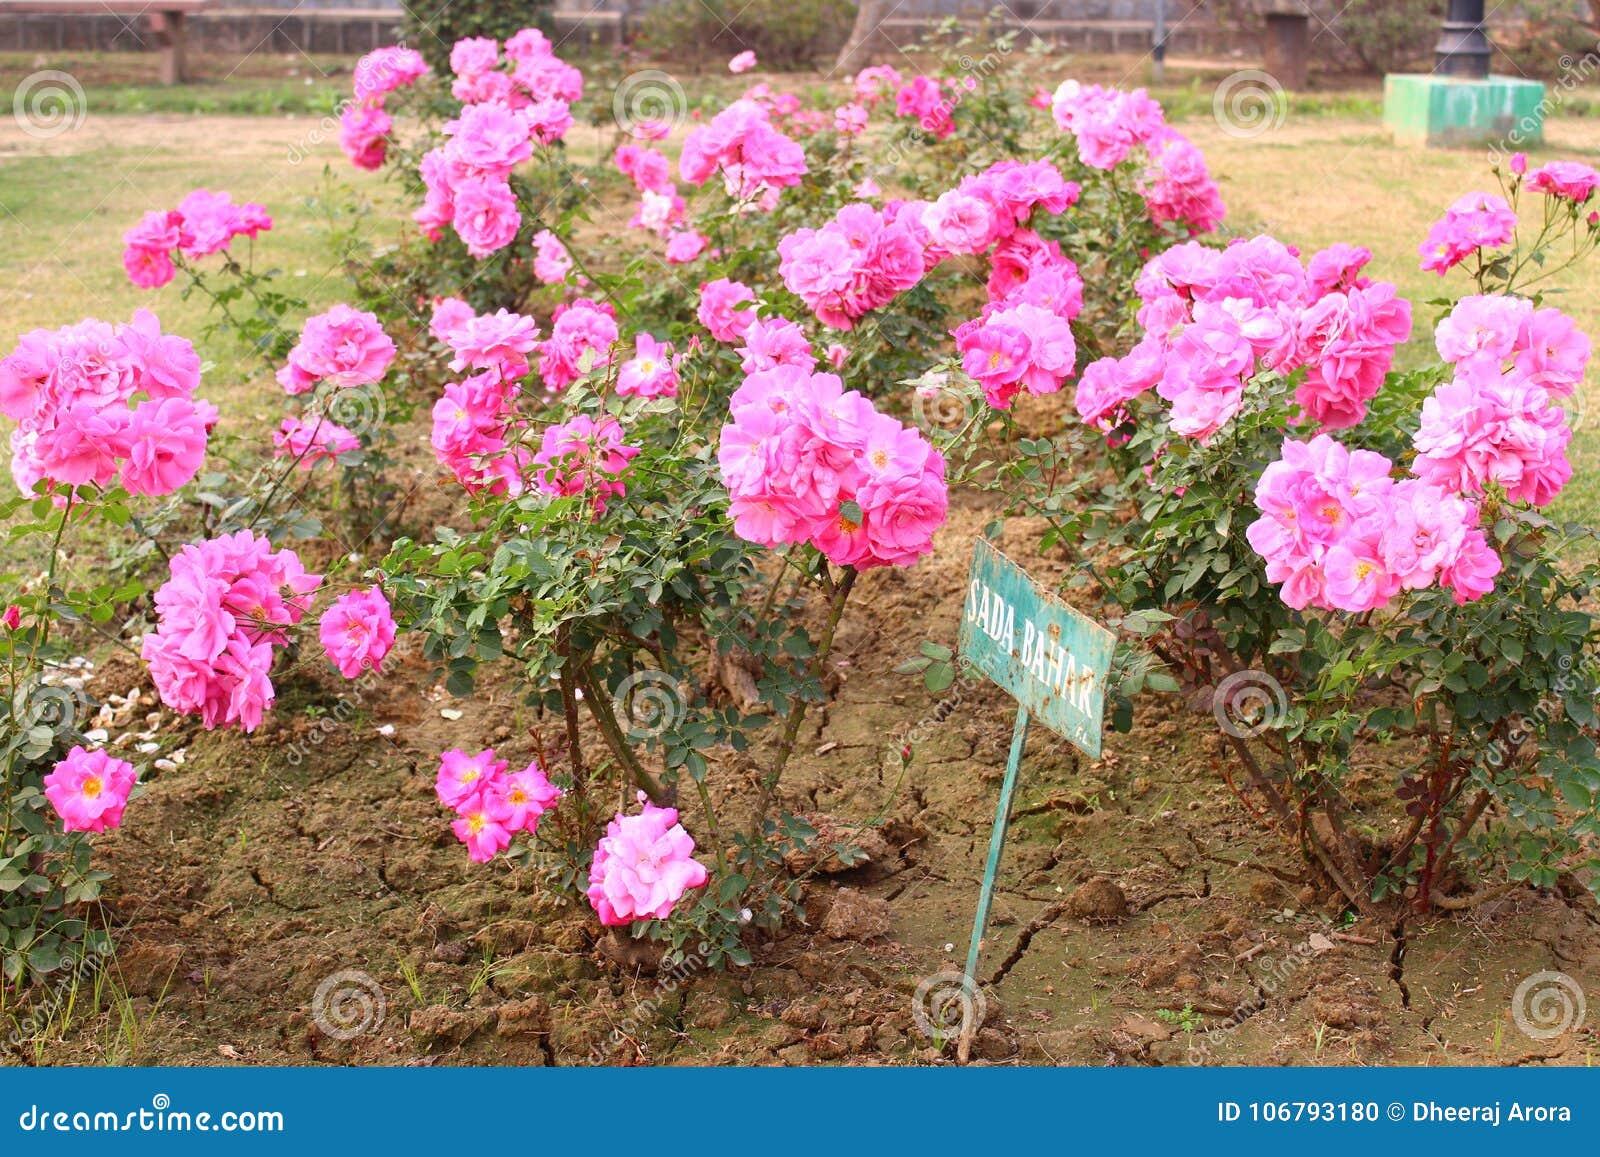 Pink Roses In National Rose Garden, New Delhi, India Stock Photo ...